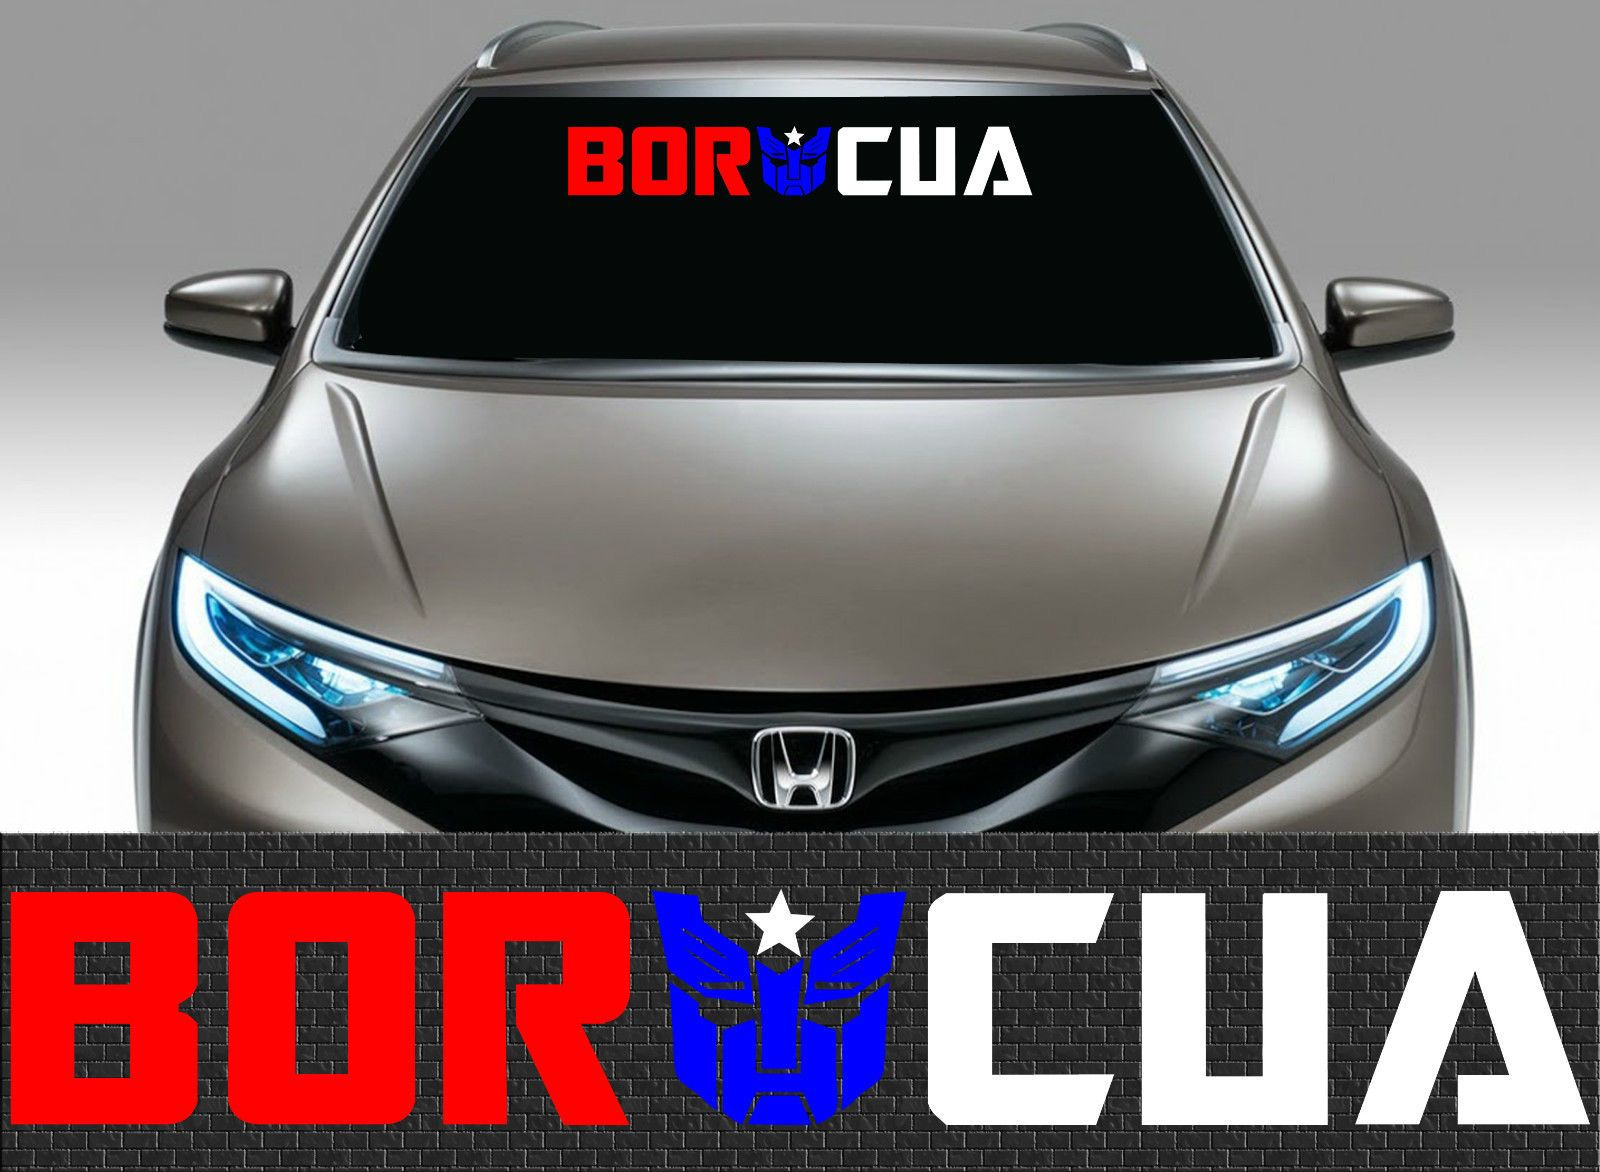 1 Puerto Rico Puerto Rican Flag Car Decal Vinyl Stickers Boricua 1691 Ebay Car Decals Stickers Flag Decal Car Decals [ 1172 x 1600 Pixel ]